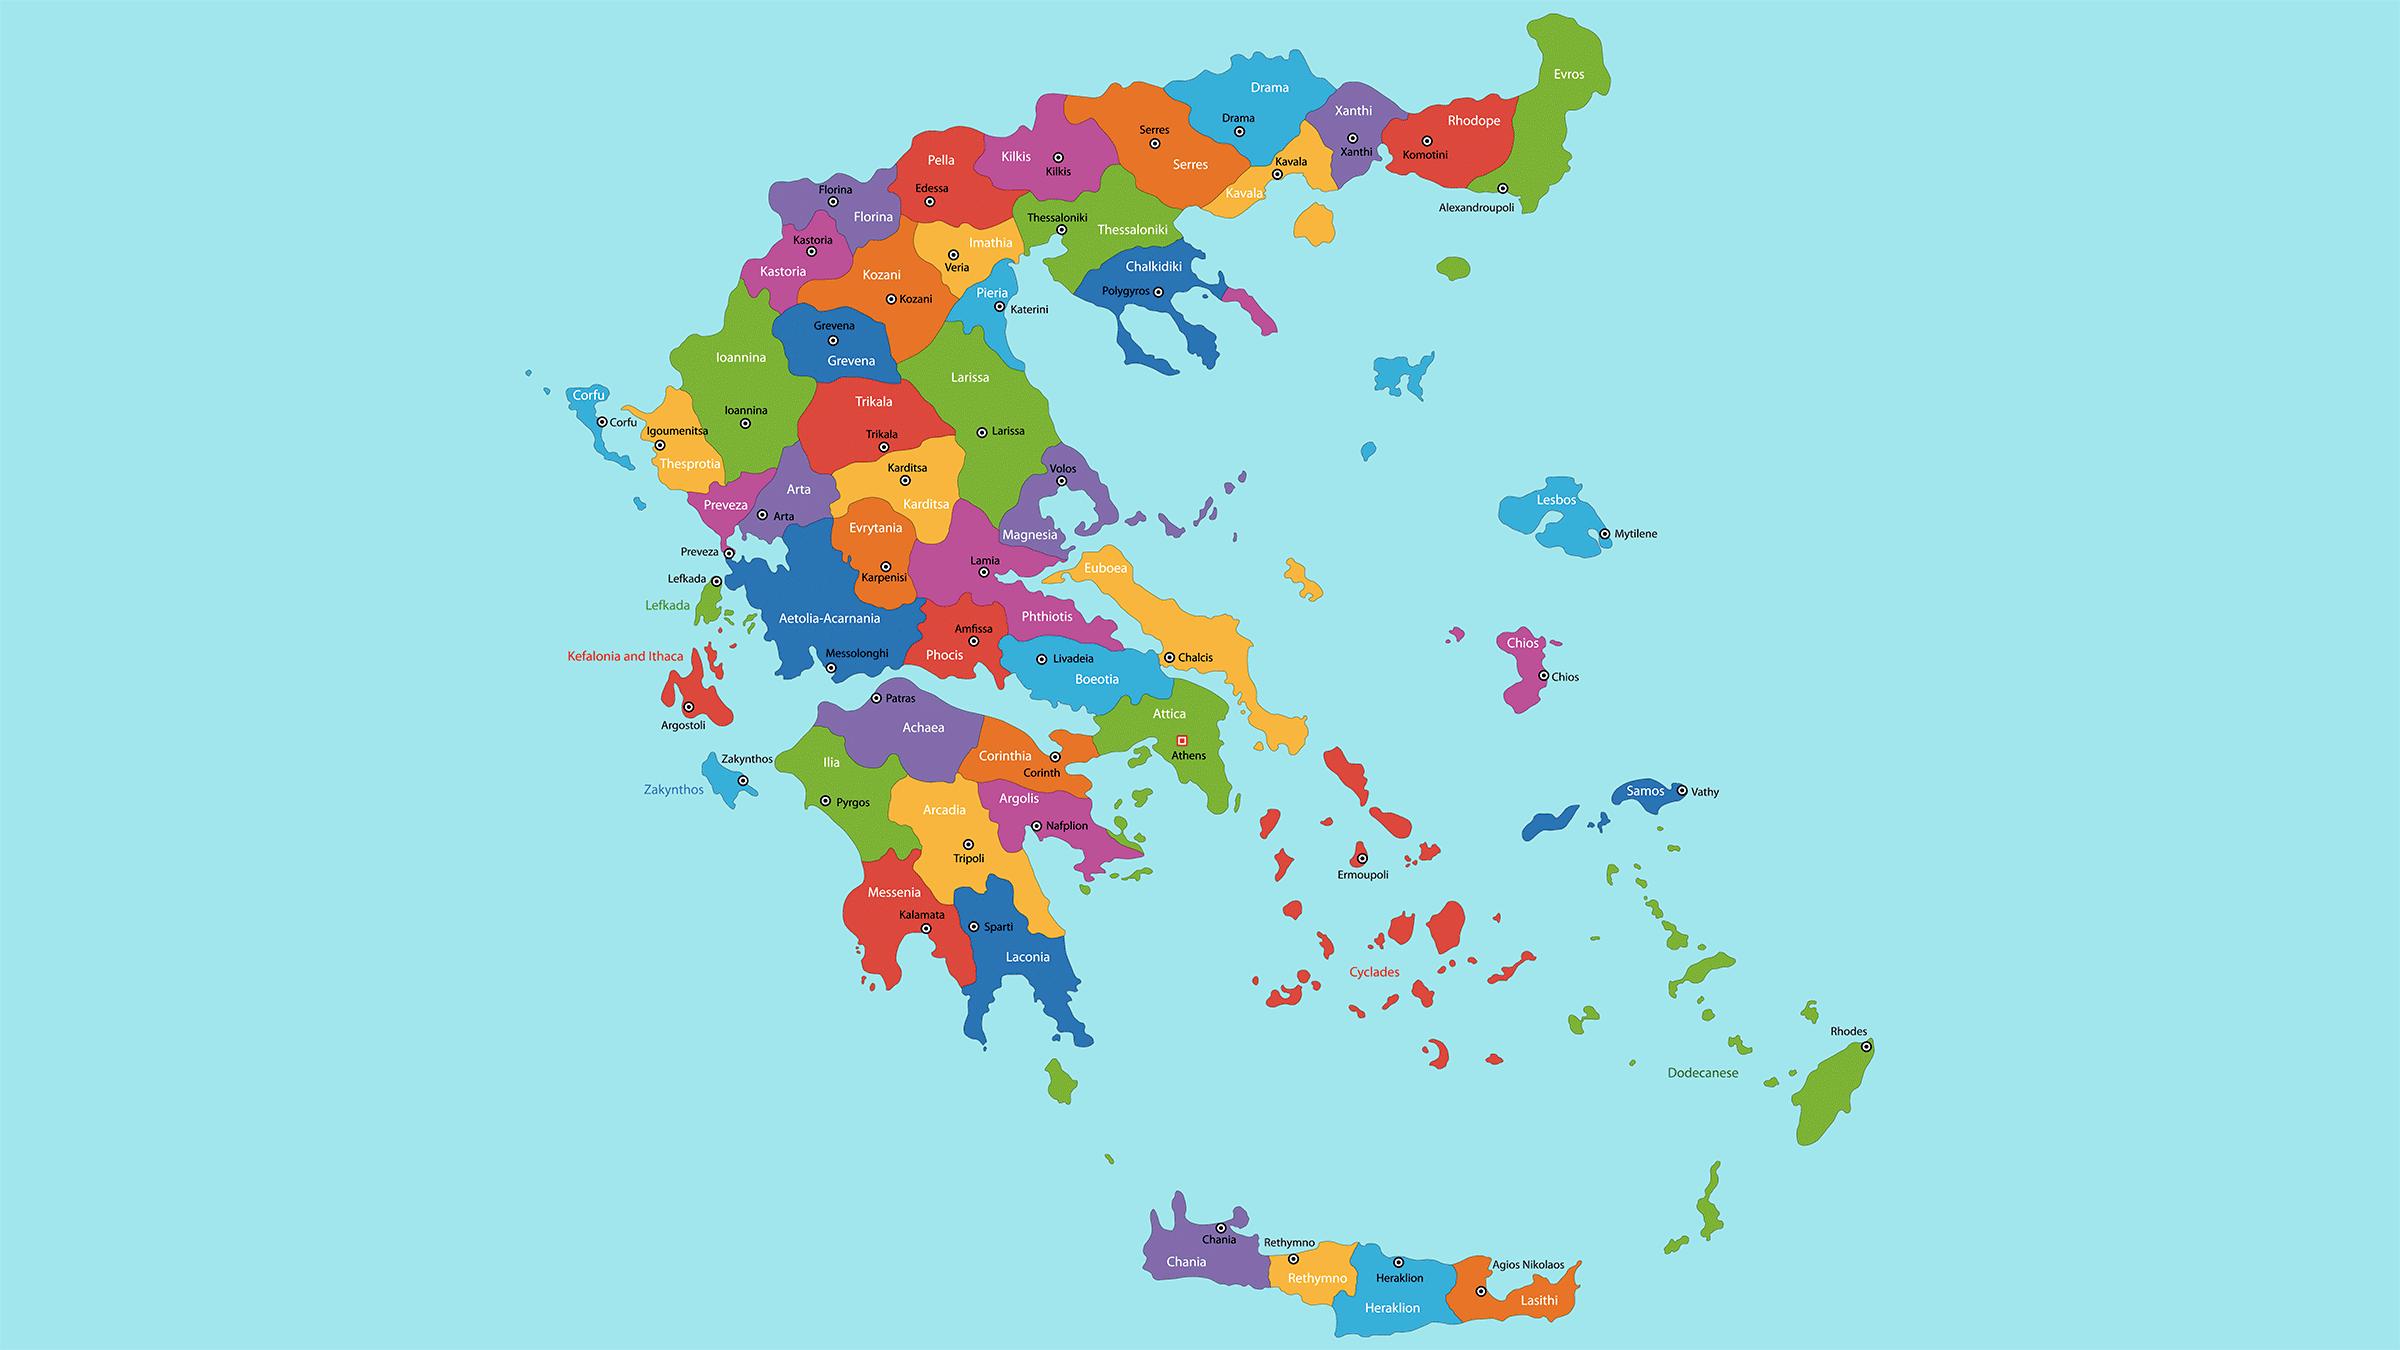 Mapa Politico De Grecia.Mapa Politico De Grecia